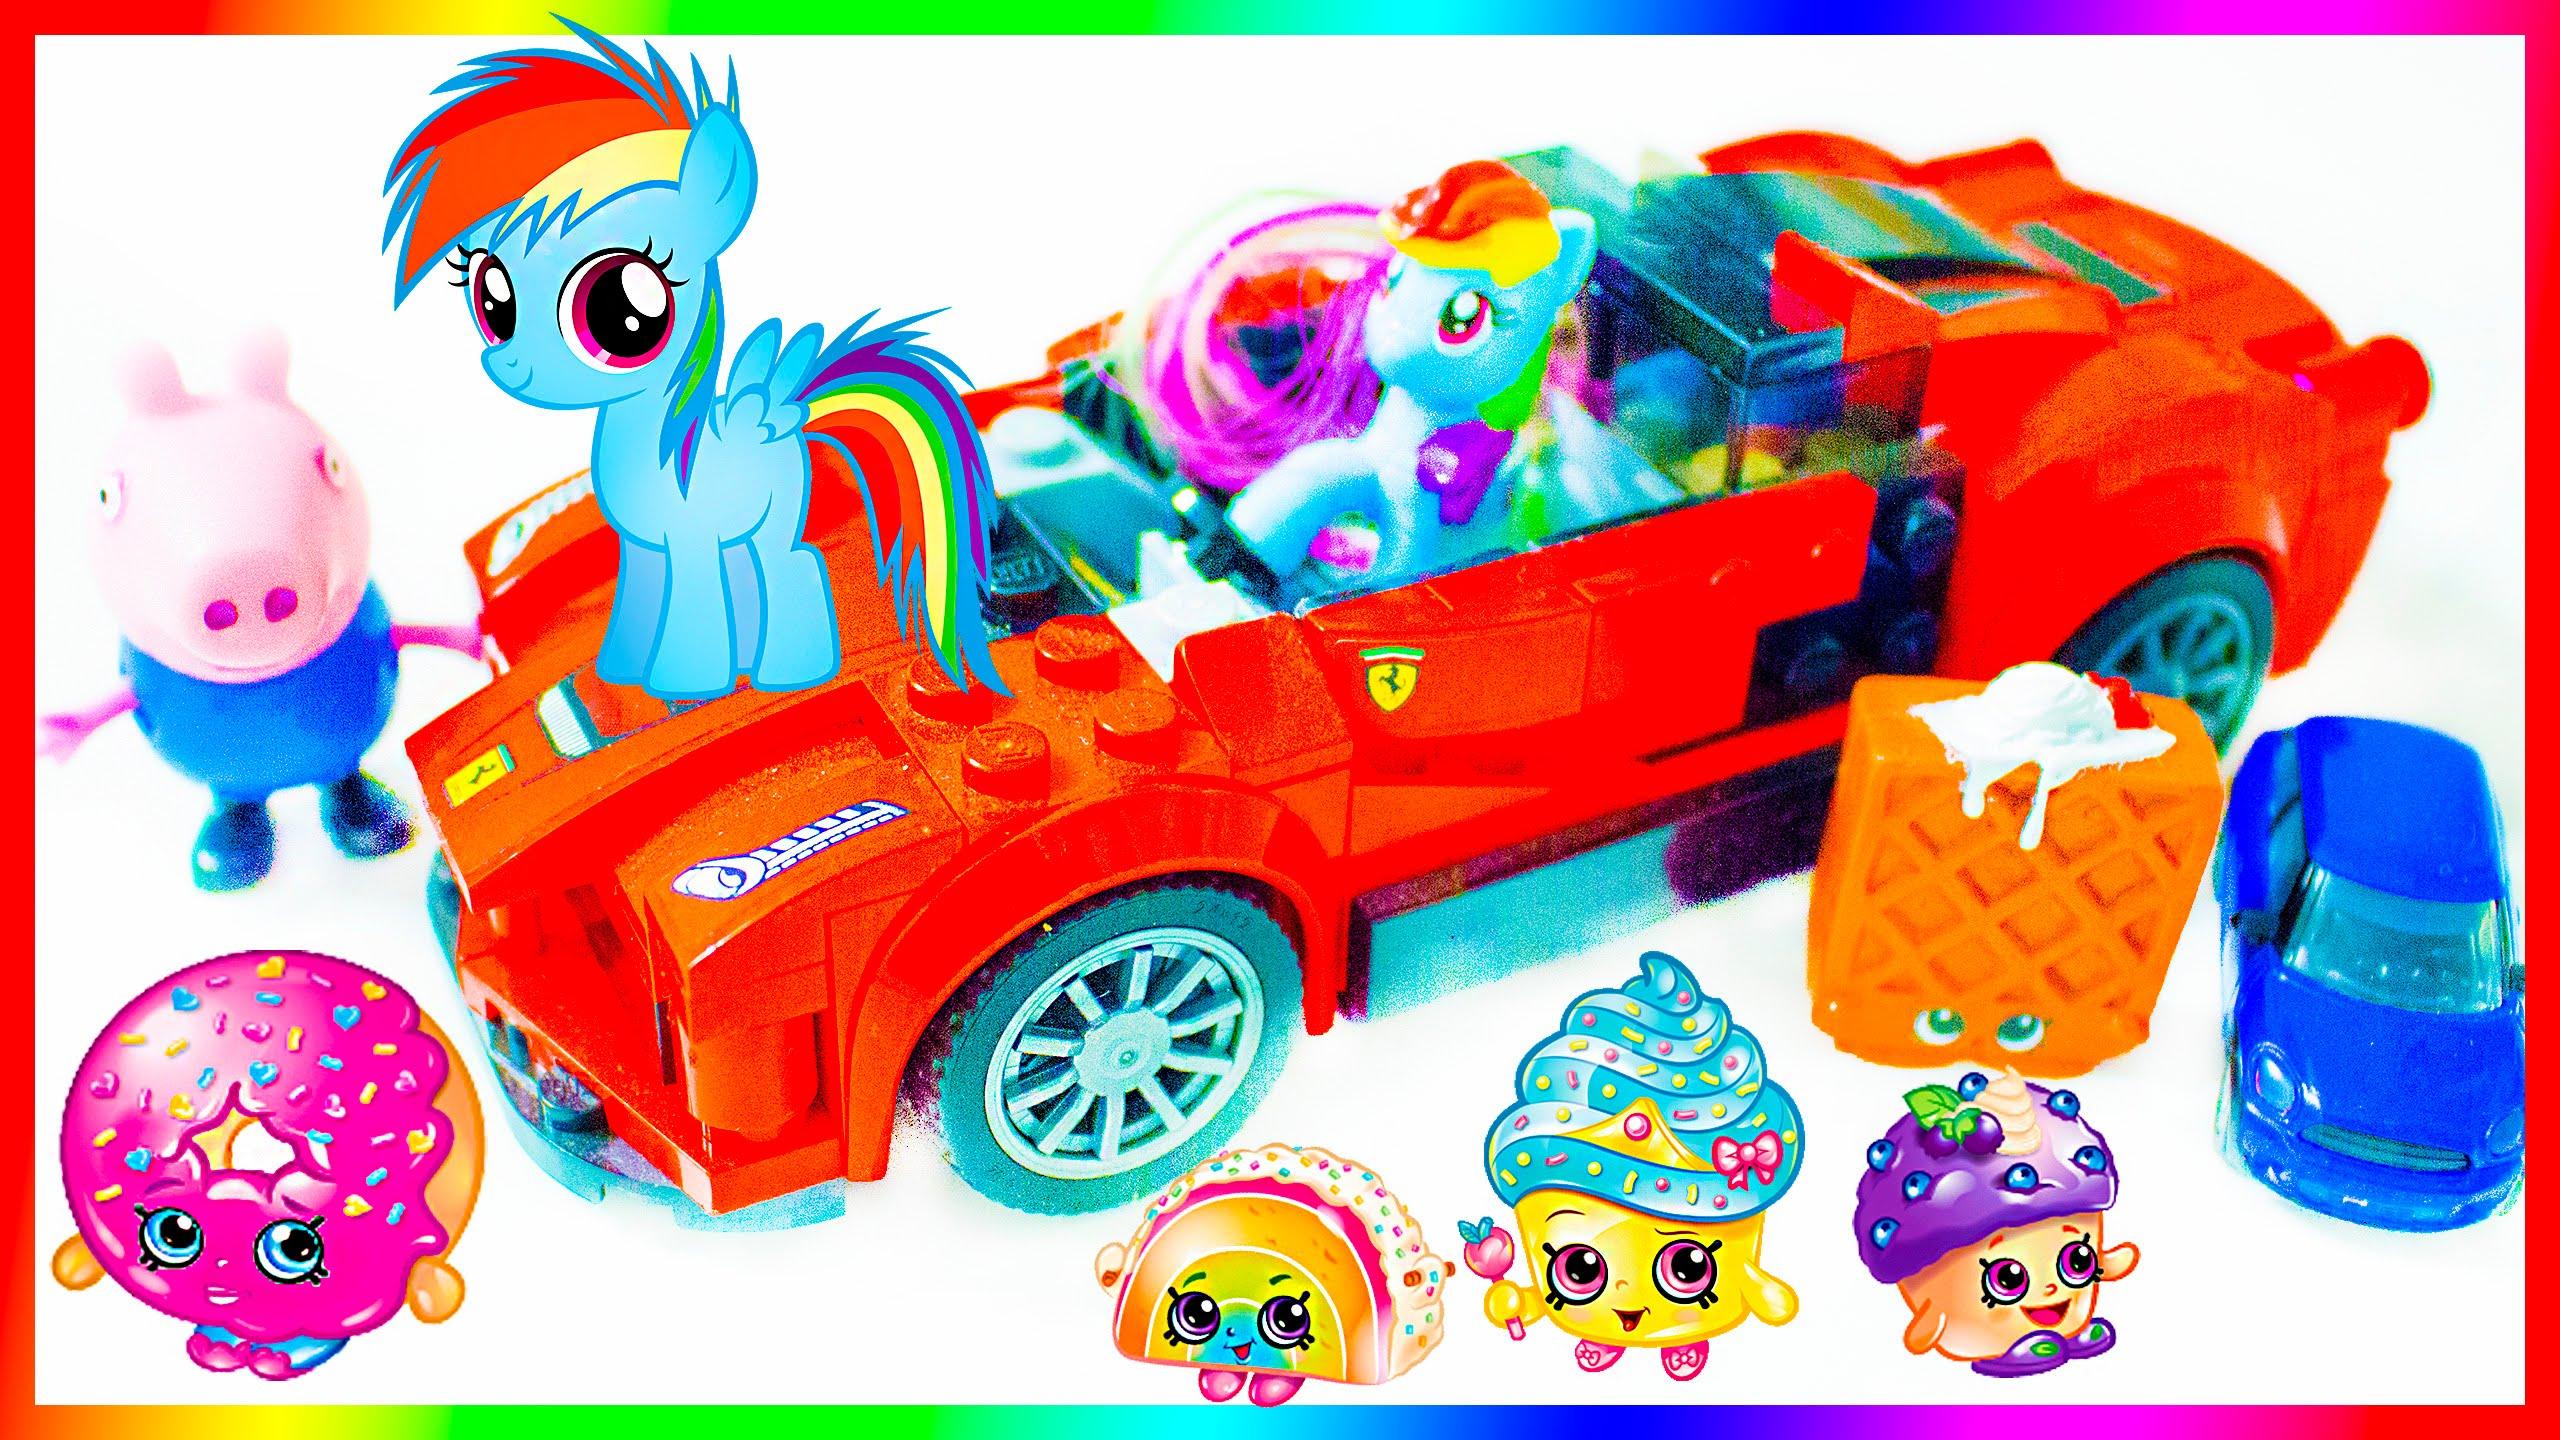 Ferarri clipart car toy #10